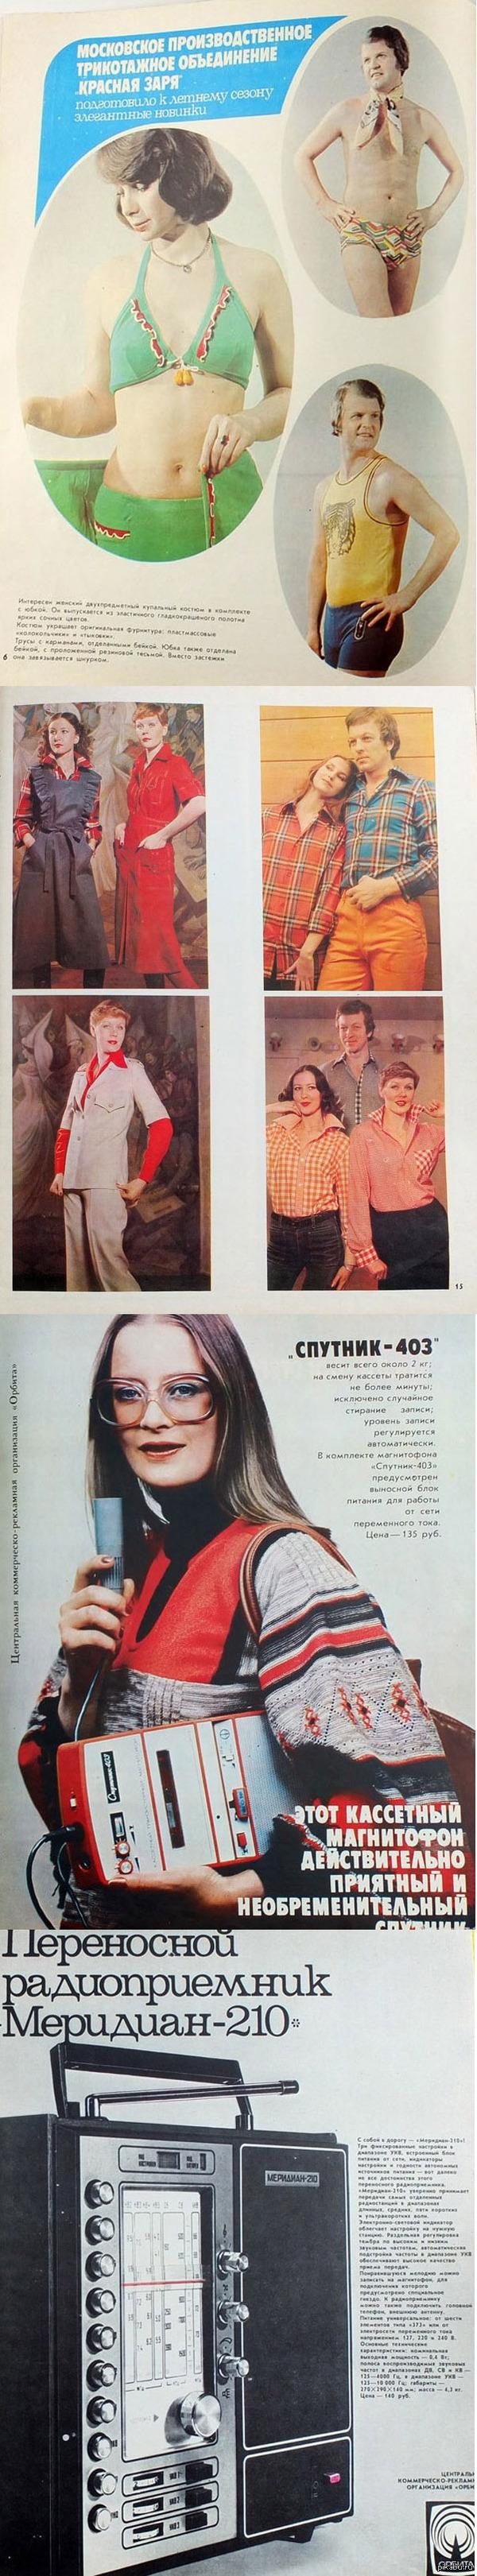 Каталог новых товаров 1970-х